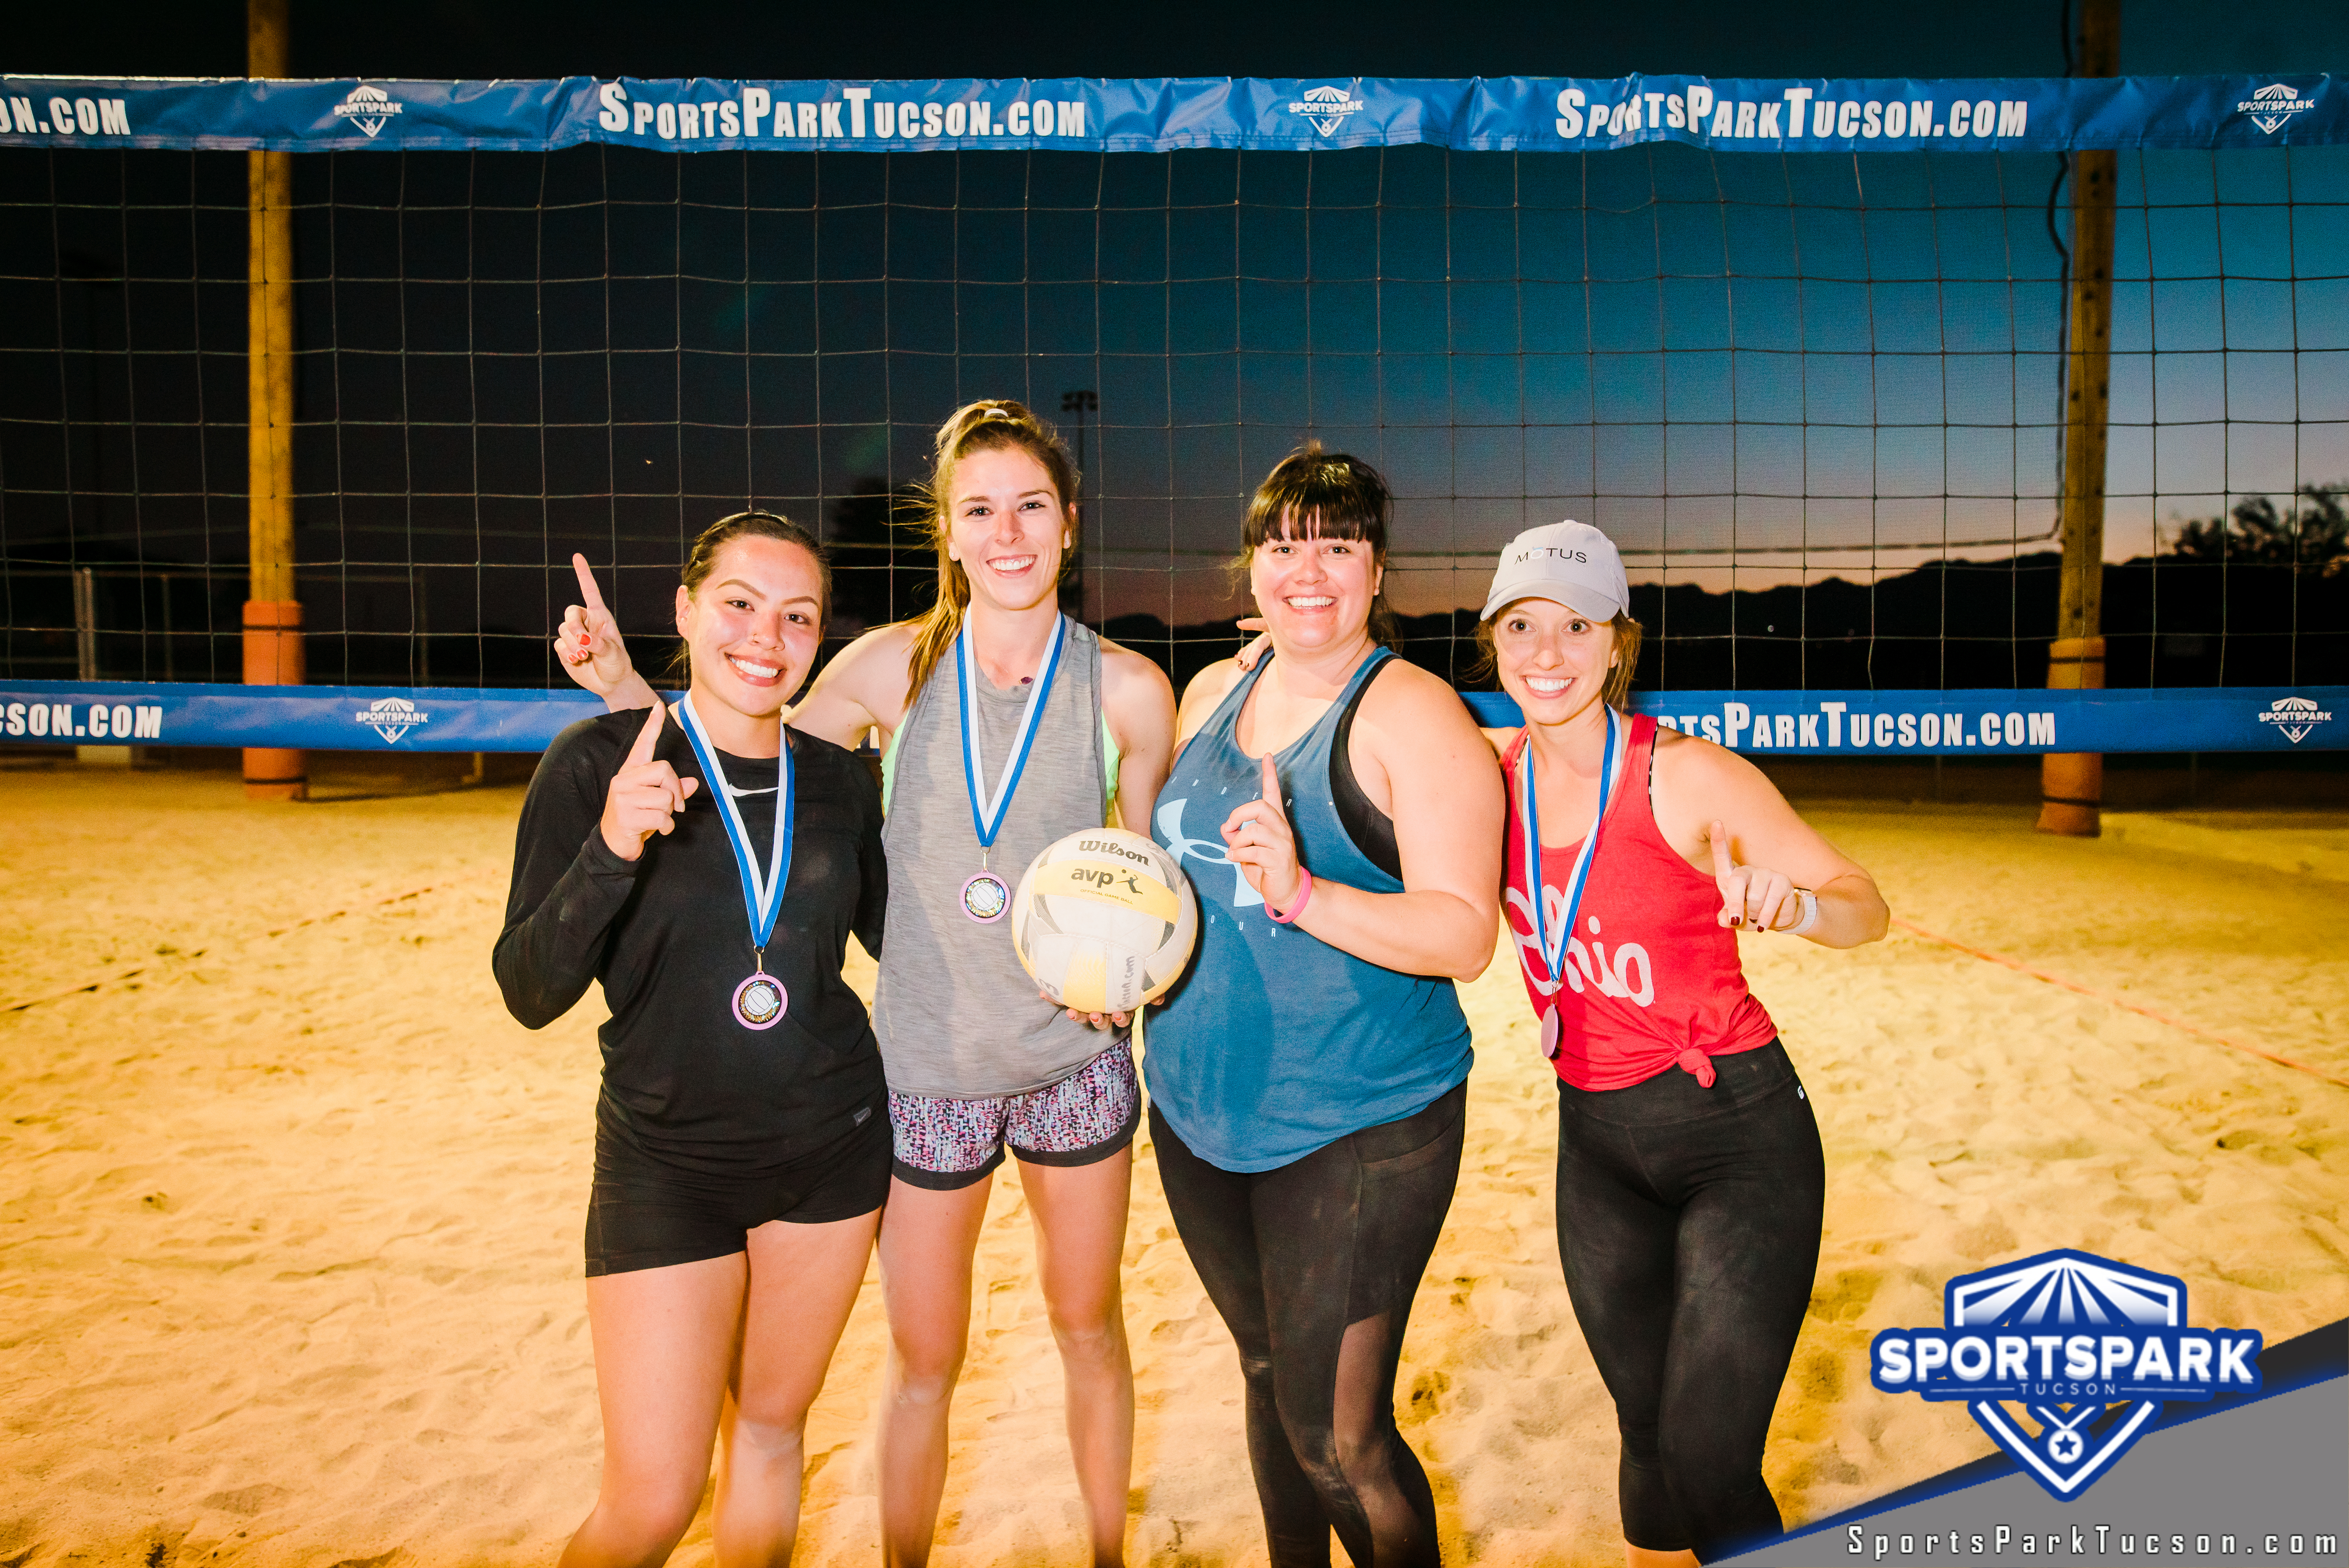 Nov 10th RWB Volleyball Tournament Women's 4v4 - A/B Champions